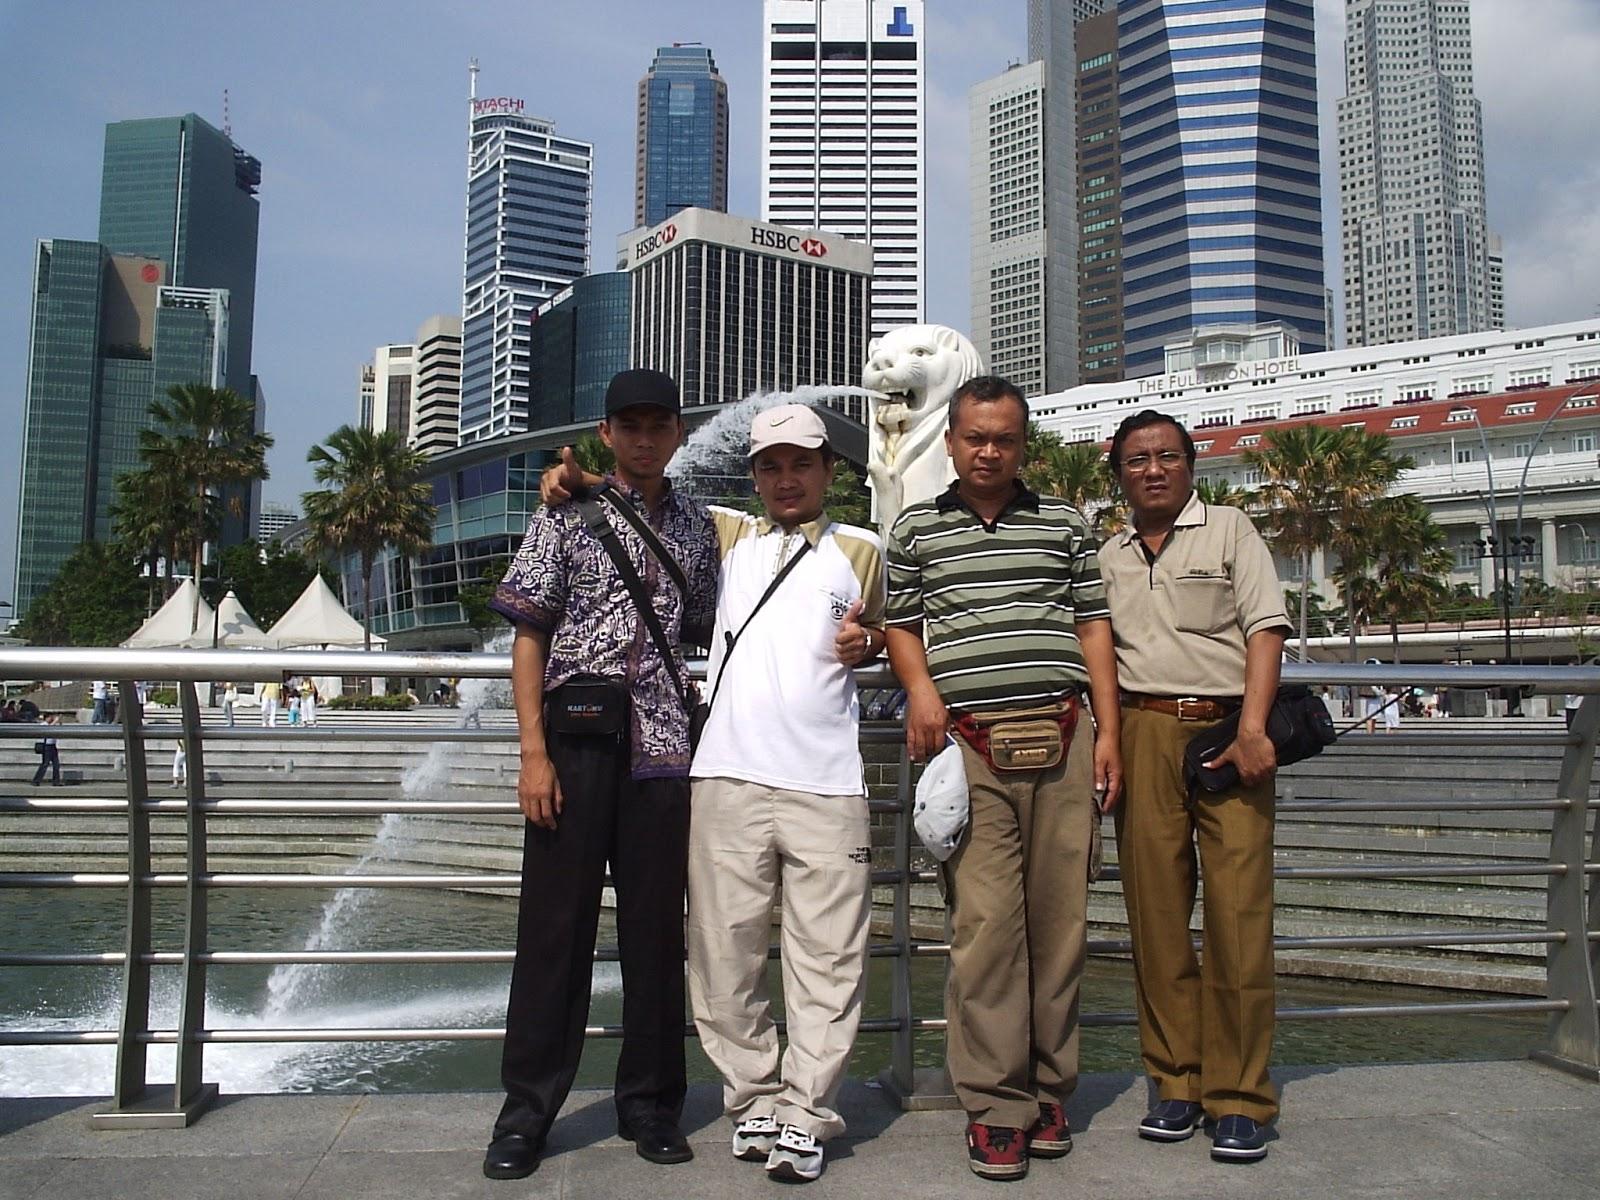 Jalan Jalan Ke Malaysia Ala Backpacker - Itb2c.store • on